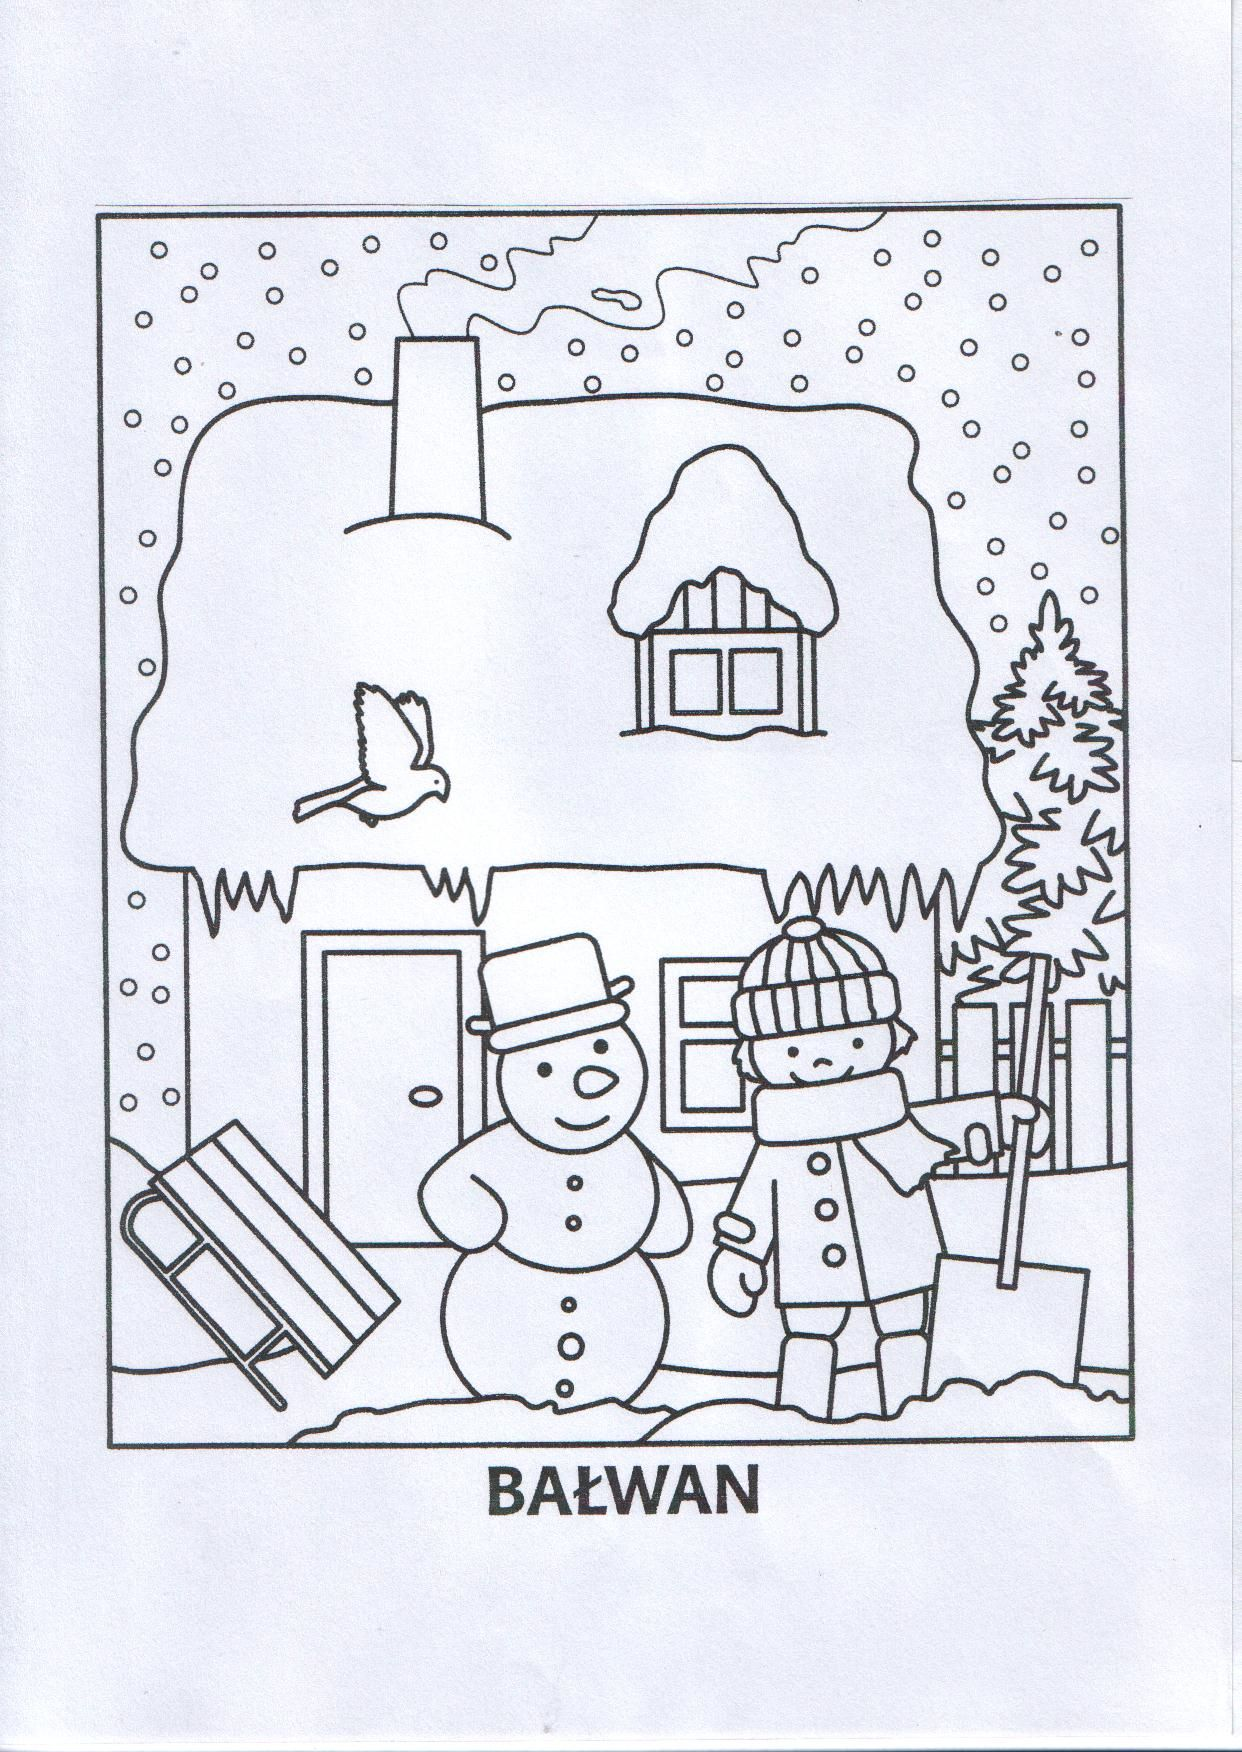 Zimowa Kolorowanka Jpg 1242 1752 Coloring Pages For Kids Coloring Pages Christmas Coloring Pages